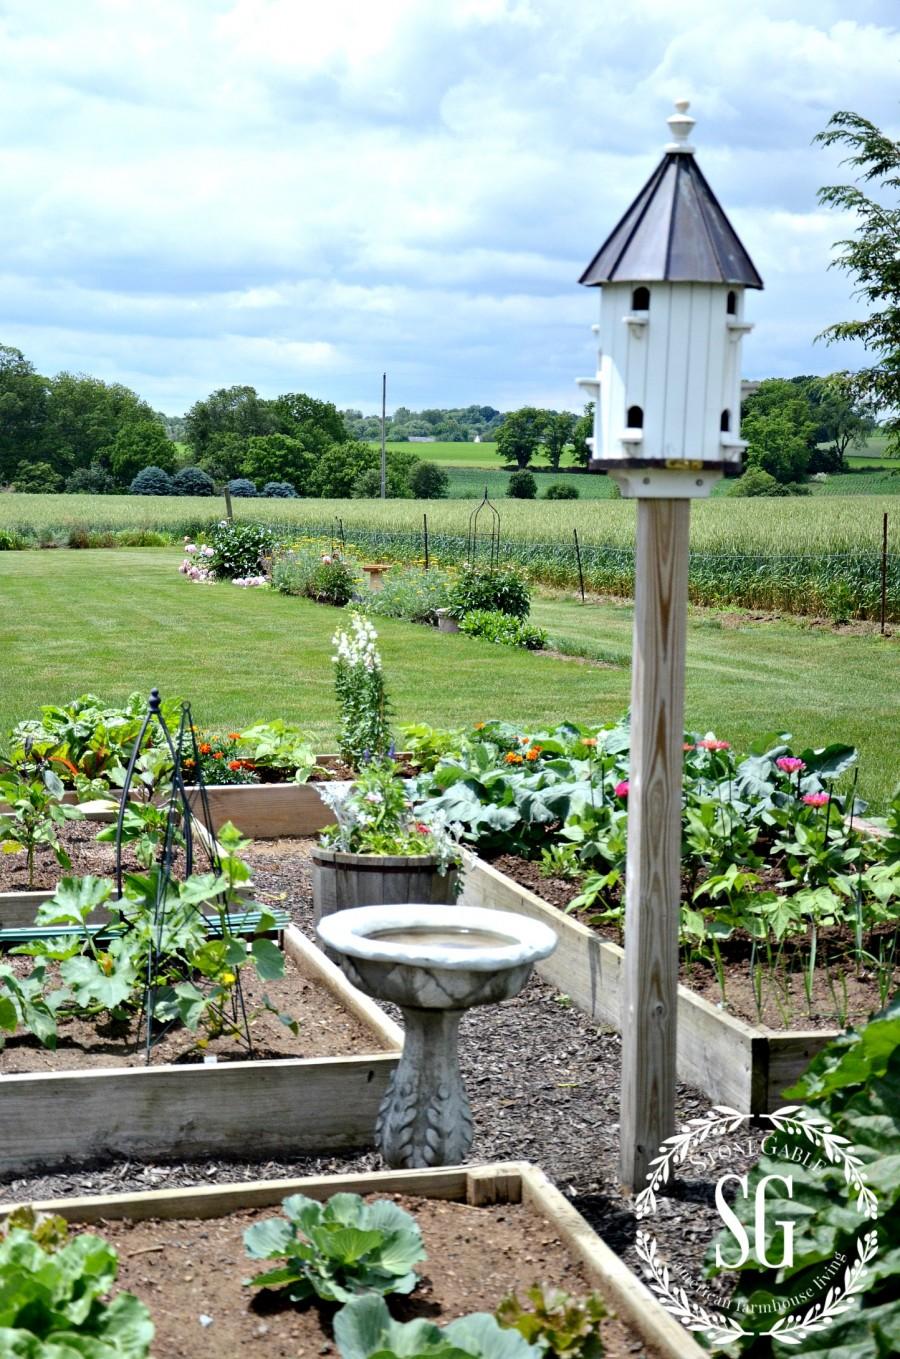 5 IMPORTANT THINGS TO KNOW WHEN GARDENING-veggie garden-stonegableblog.com